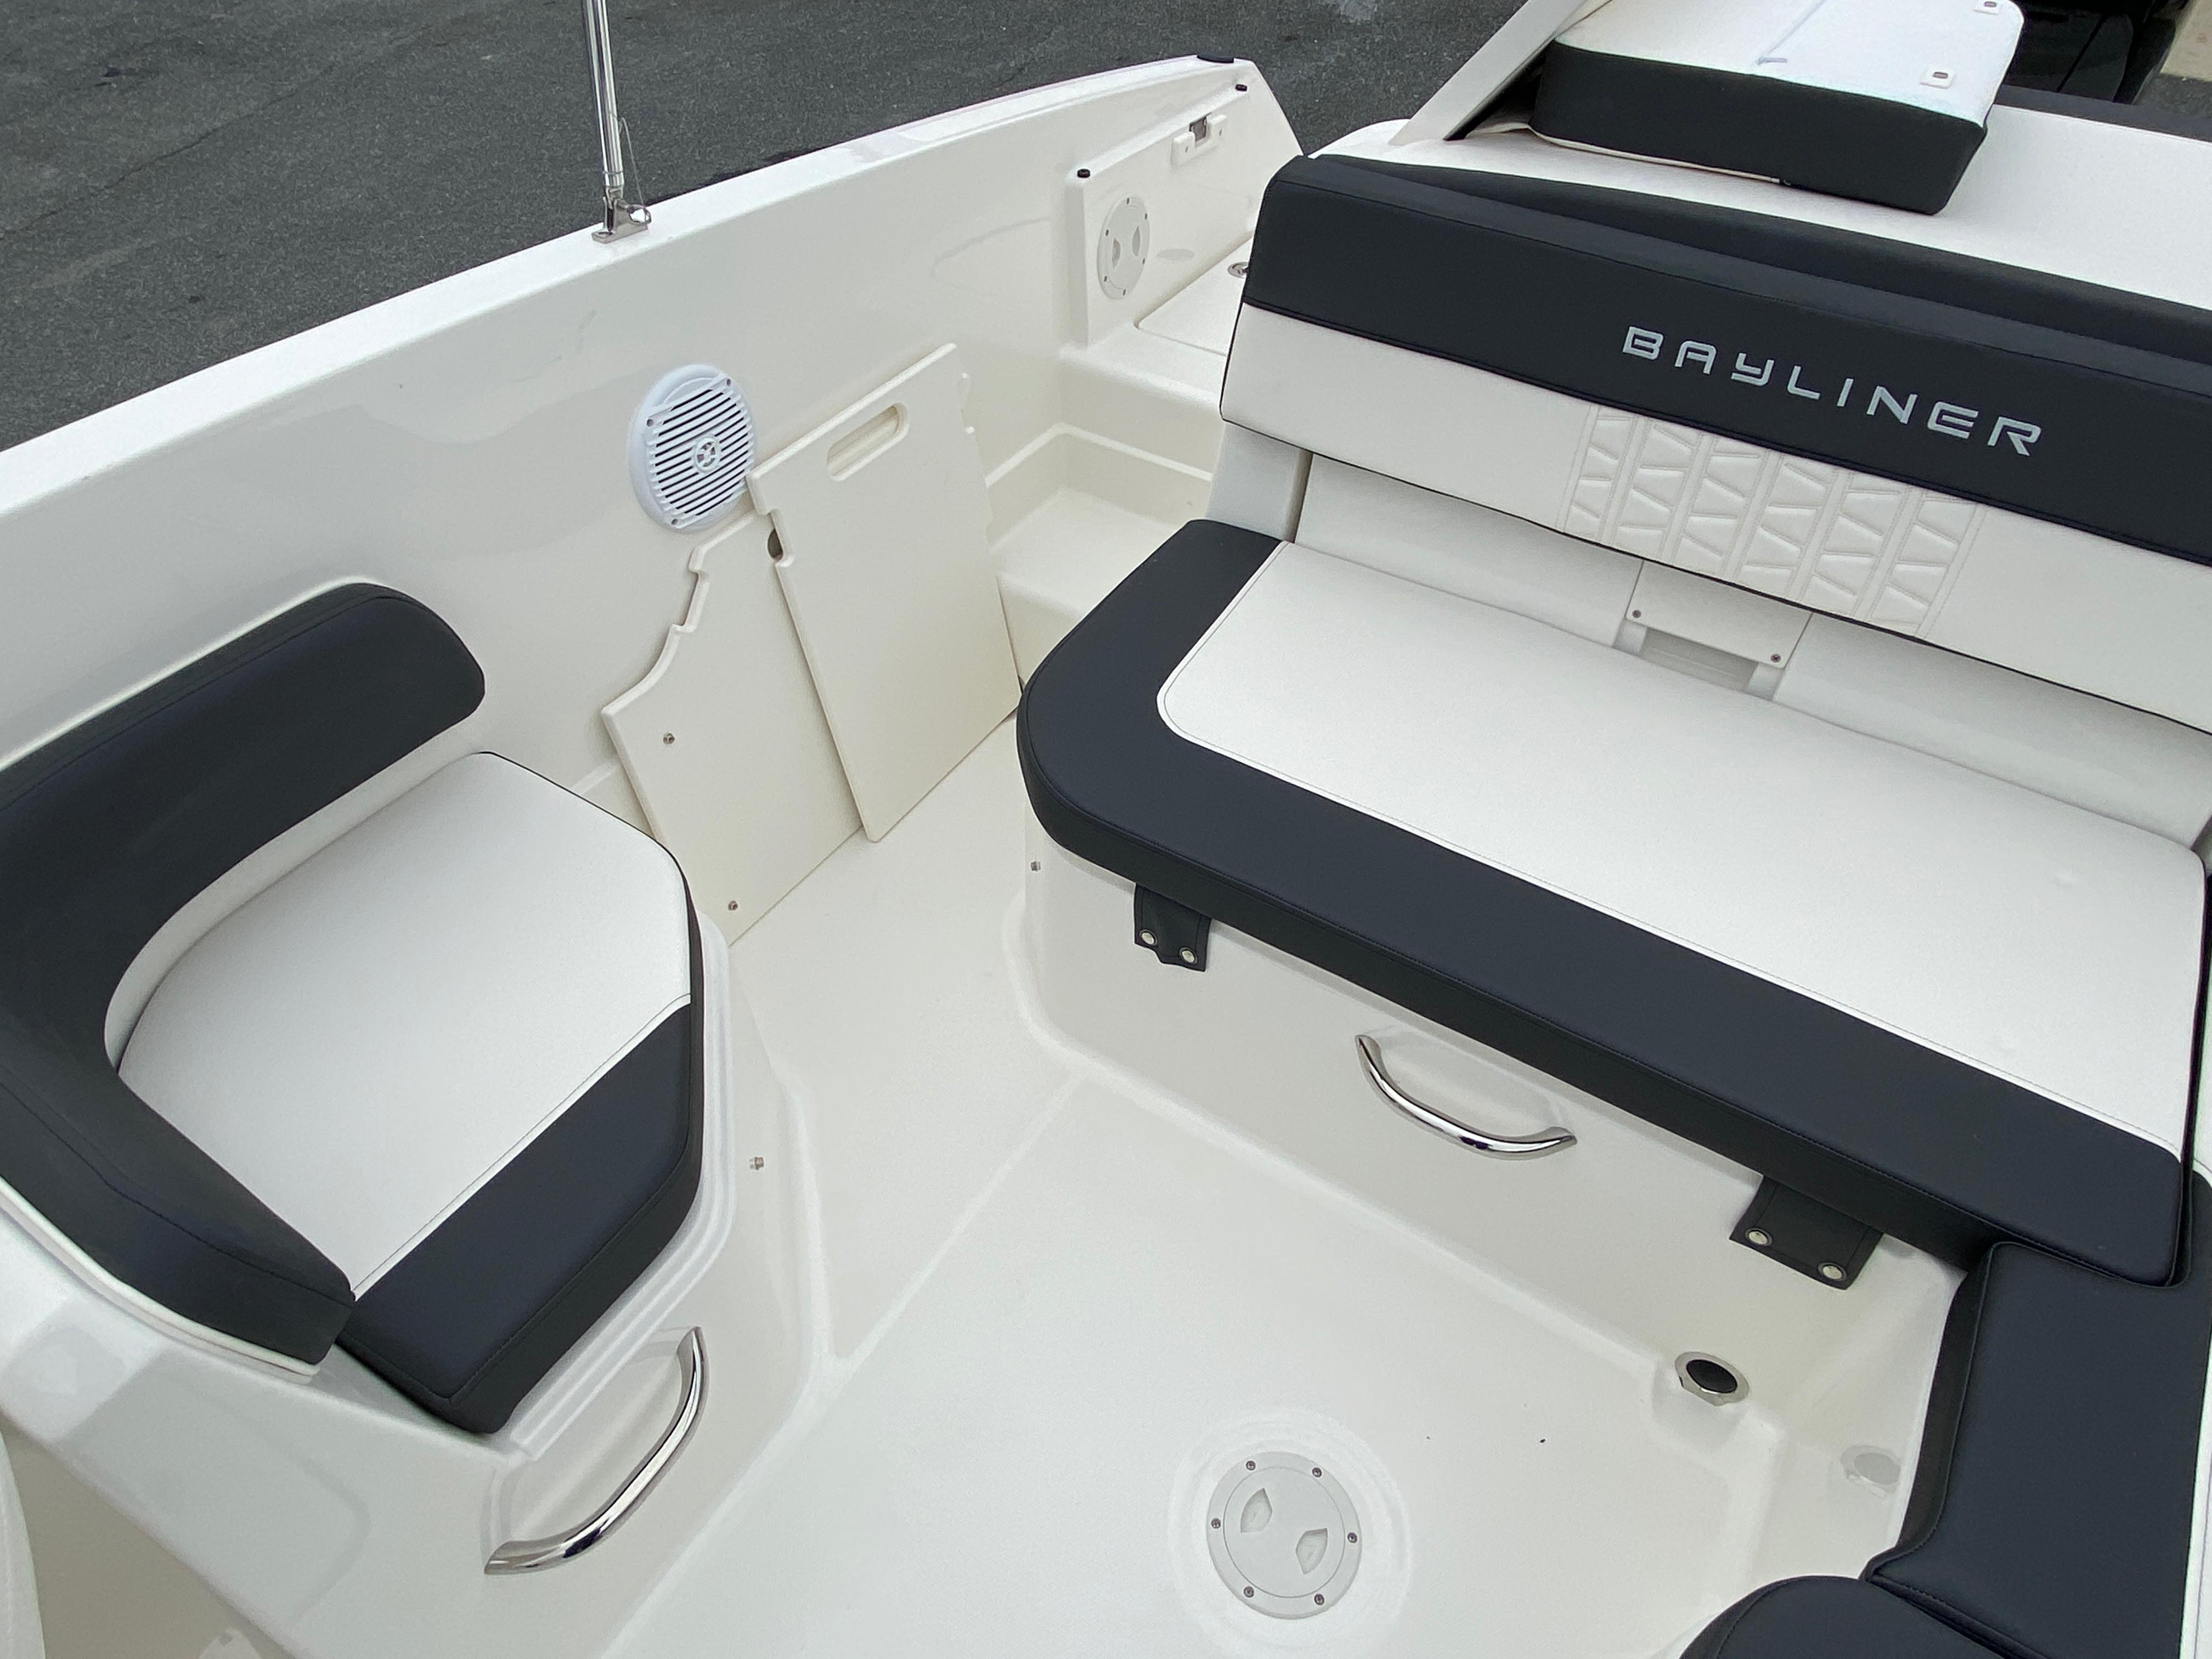 2020 Bayliner boat for sale, model of the boat is VR6 Bowrider & Image # 7 of 14